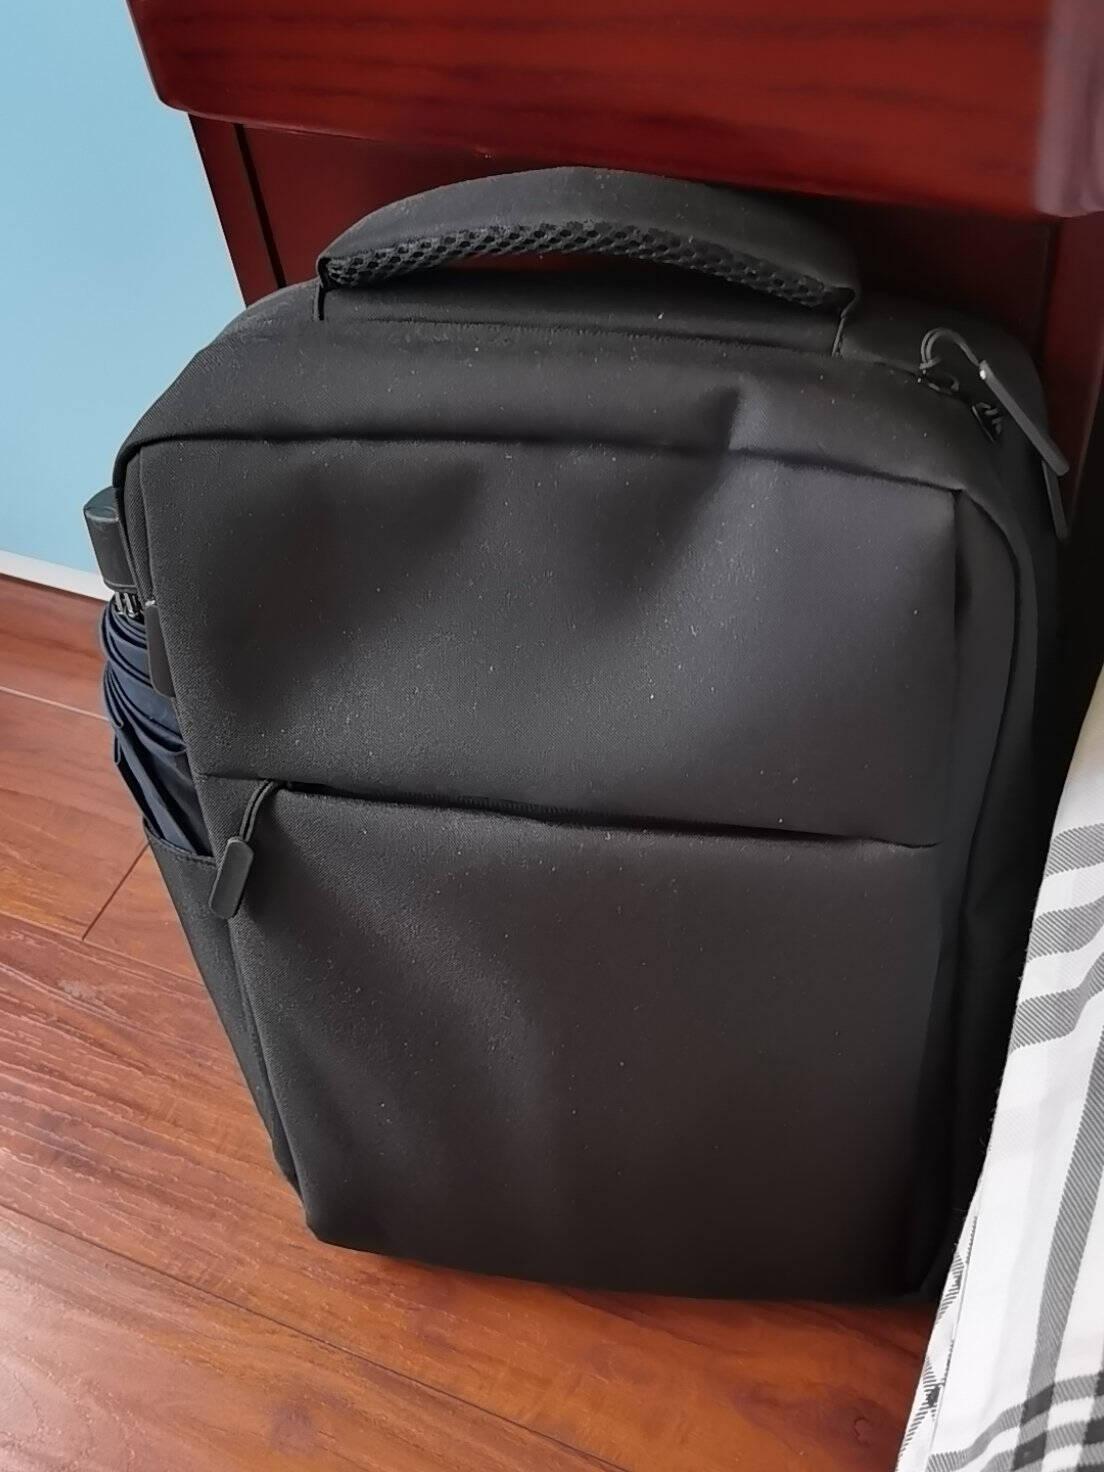 JRC联想拯救者笔记本15.6英寸电脑包双肩包背包商务休闲电竞旅行背包旅游包飞行堡垒小米游戏本书包黑色